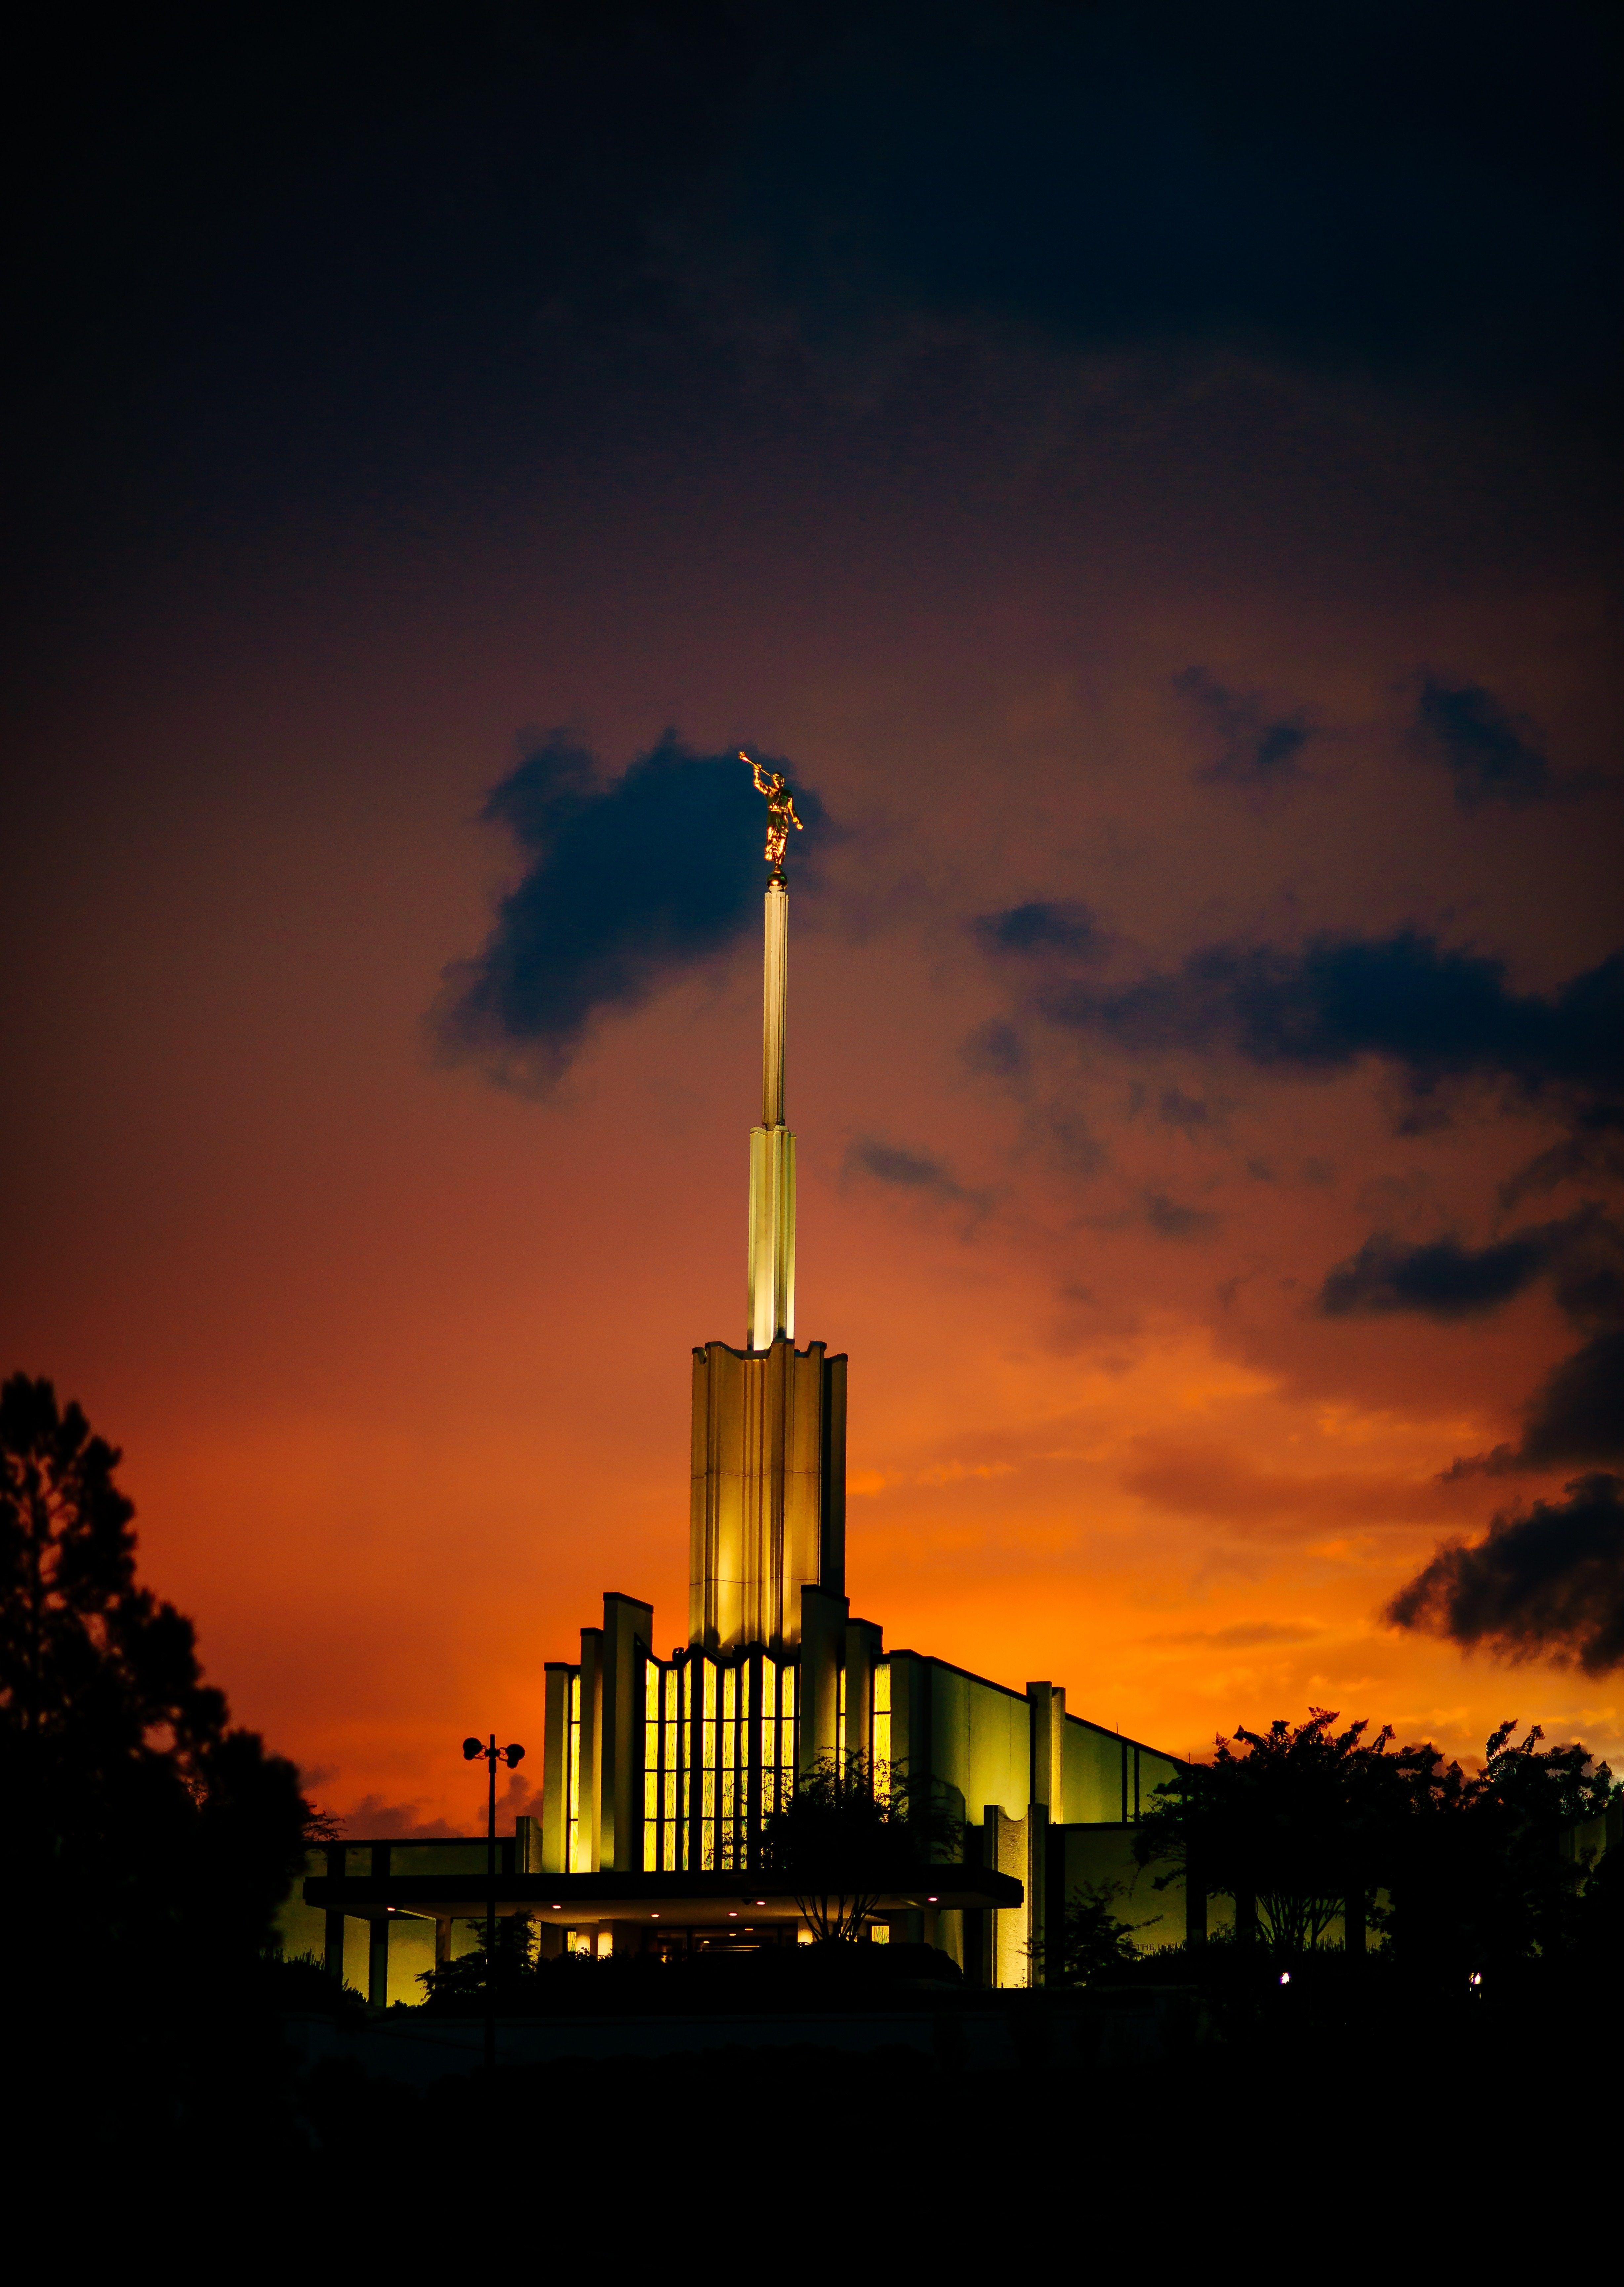 The Atlanta Georgia Temple is lit up at night.